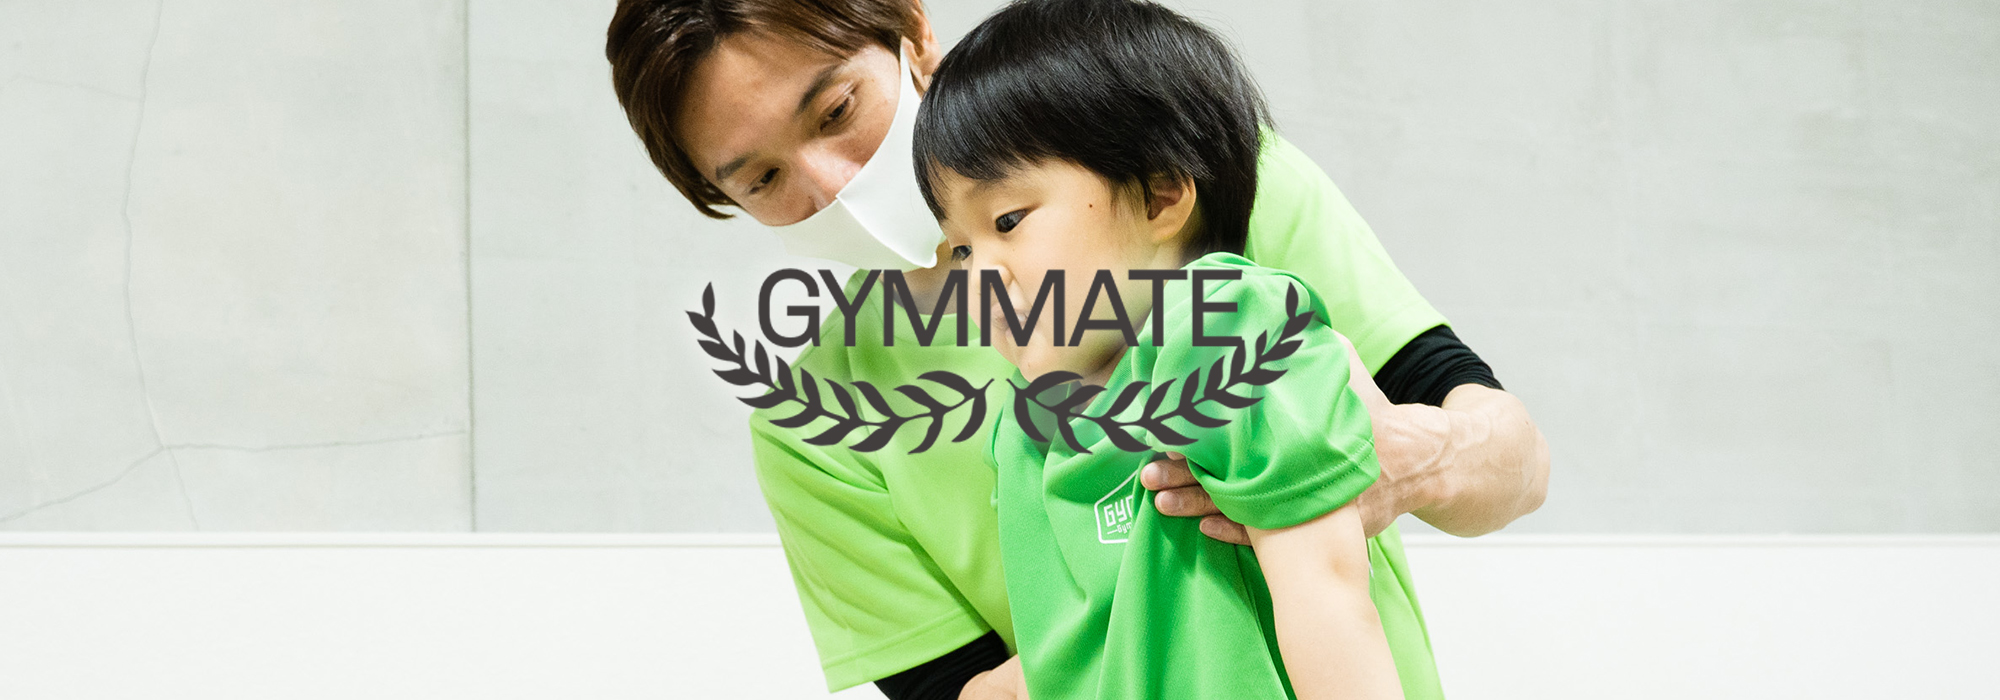 GYMMATE